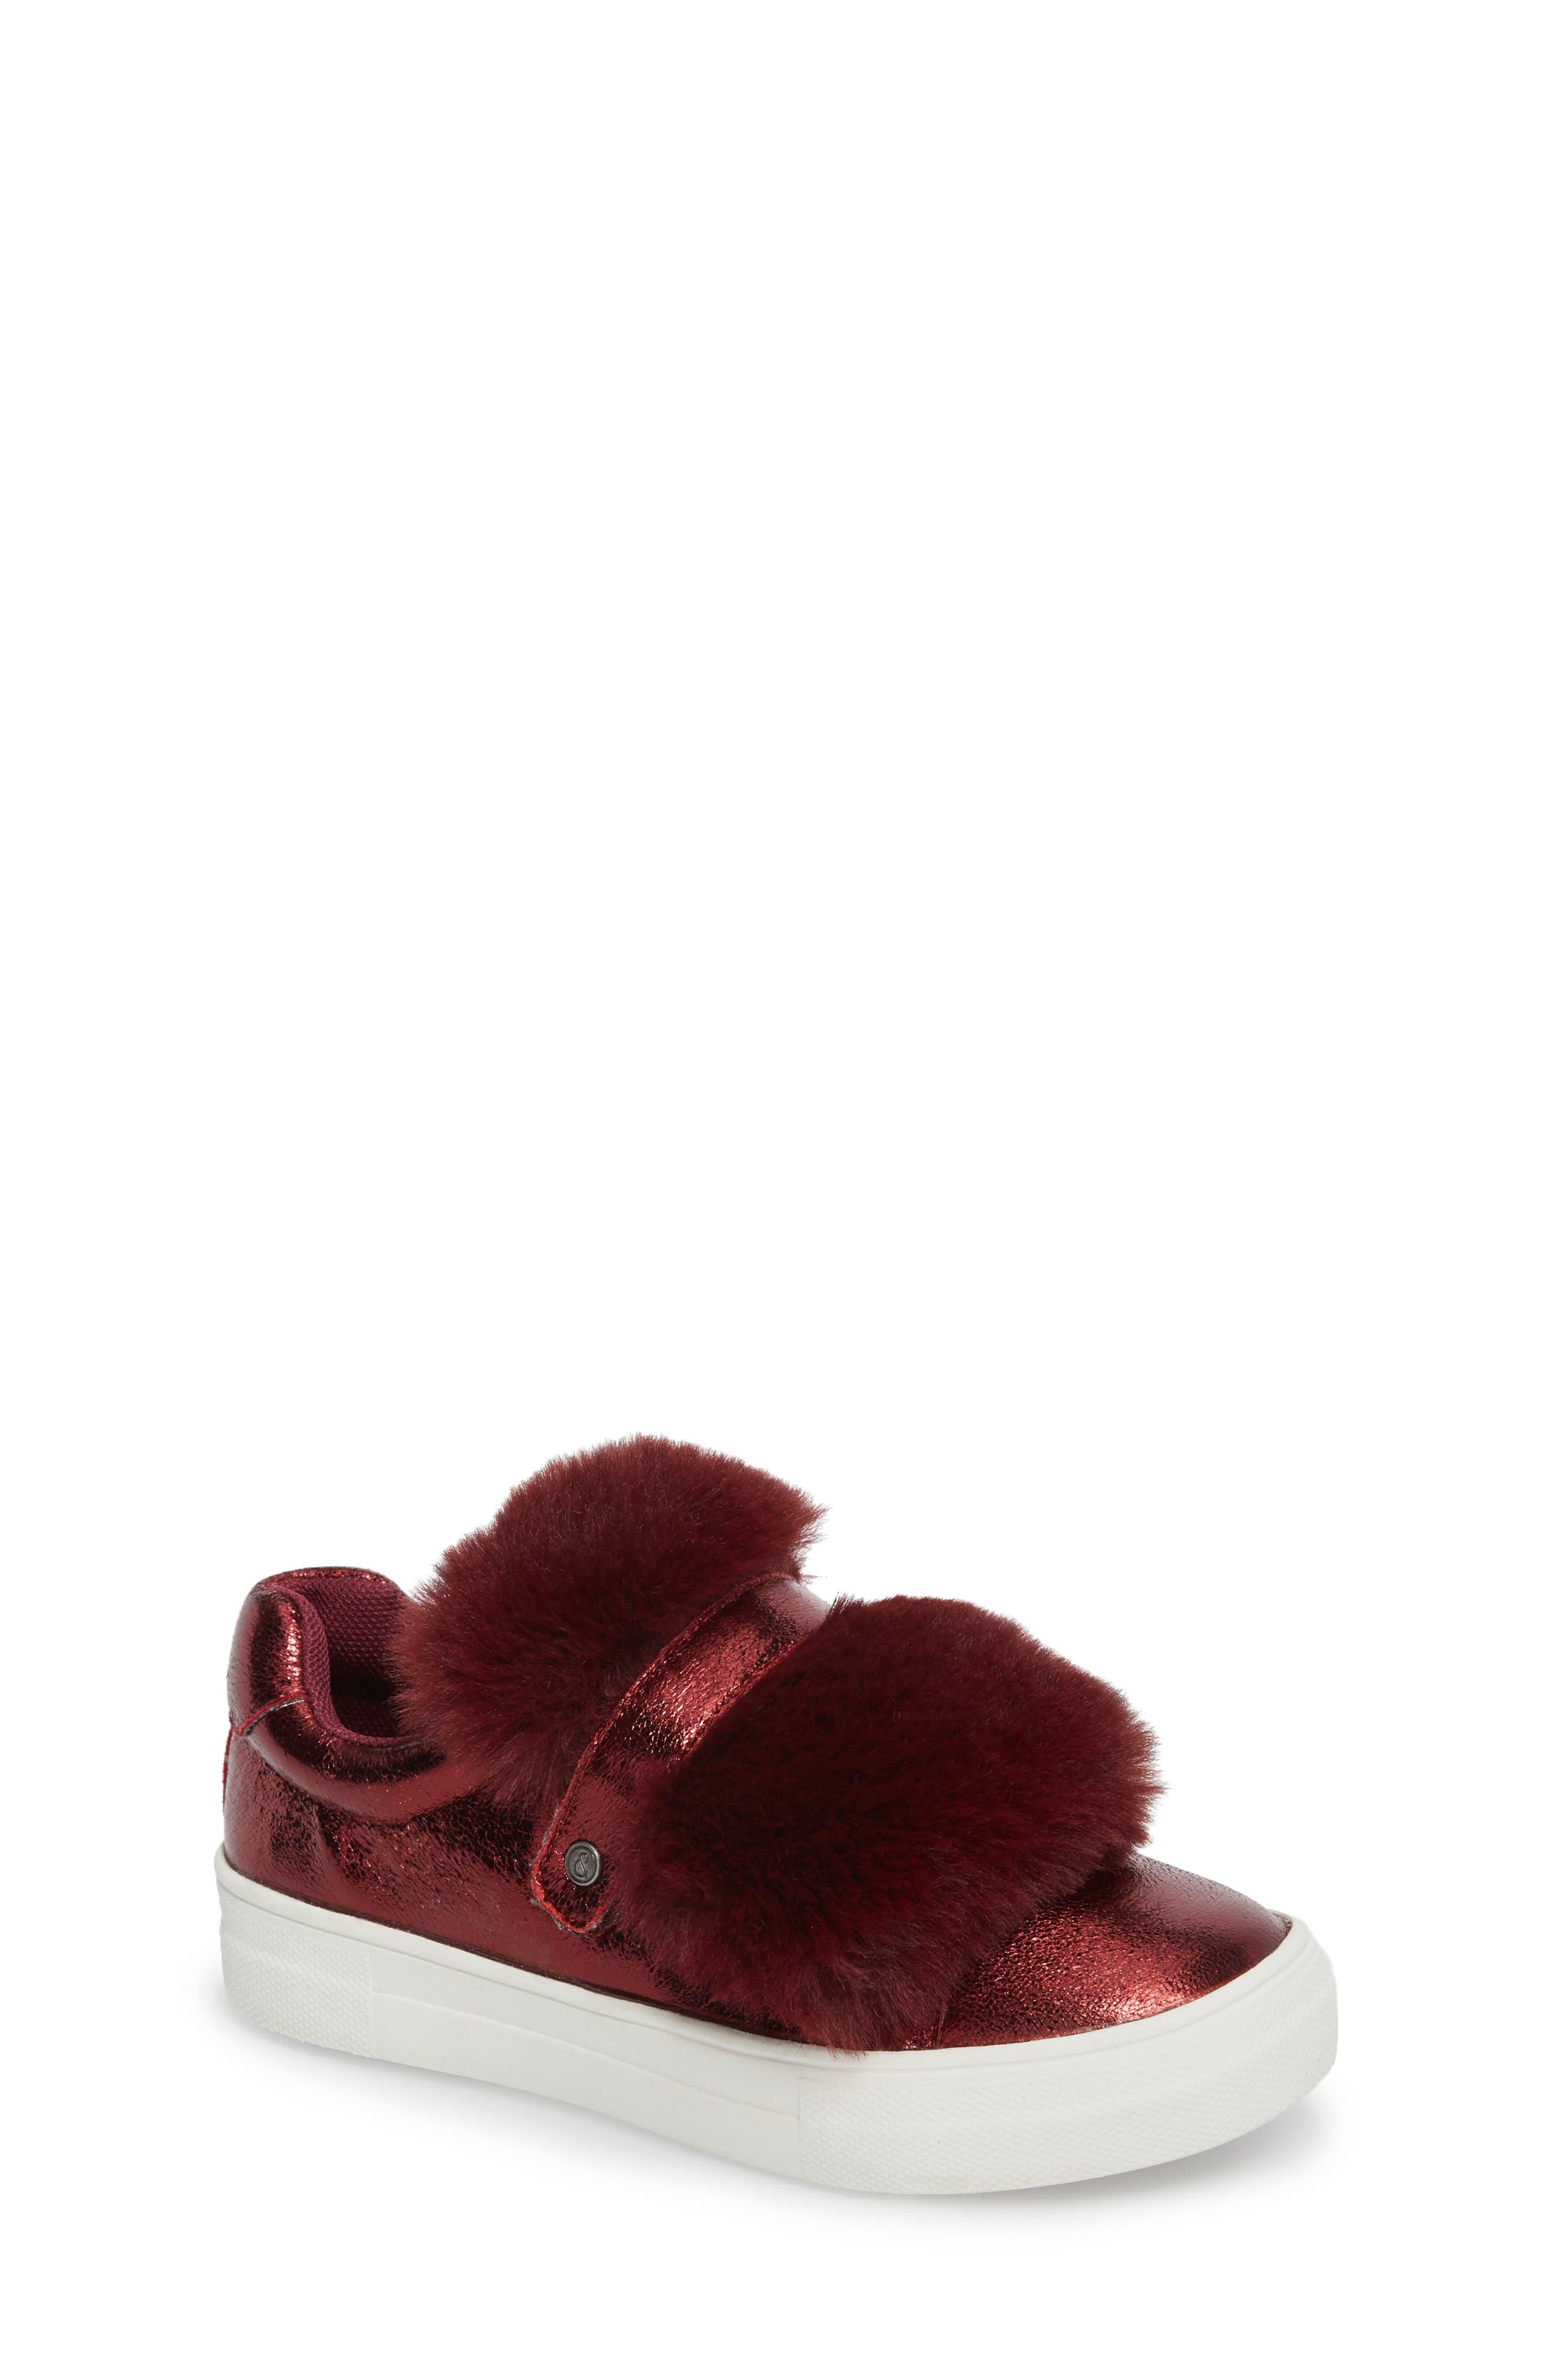 Zandra Faux Fur Metallic Sneaker,                         Main,                         color, Burgundy Faux Leather